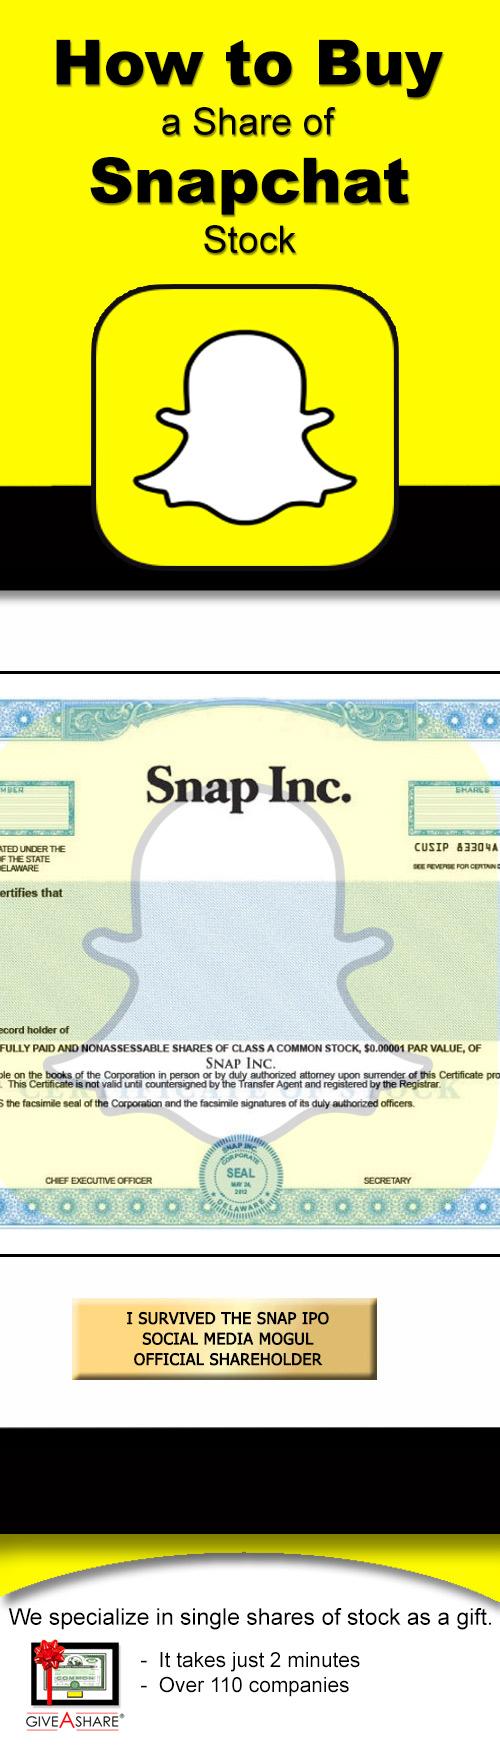 Buy snapchat stock life hacks business and money matters buy snapchat stock ccuart Choice Image